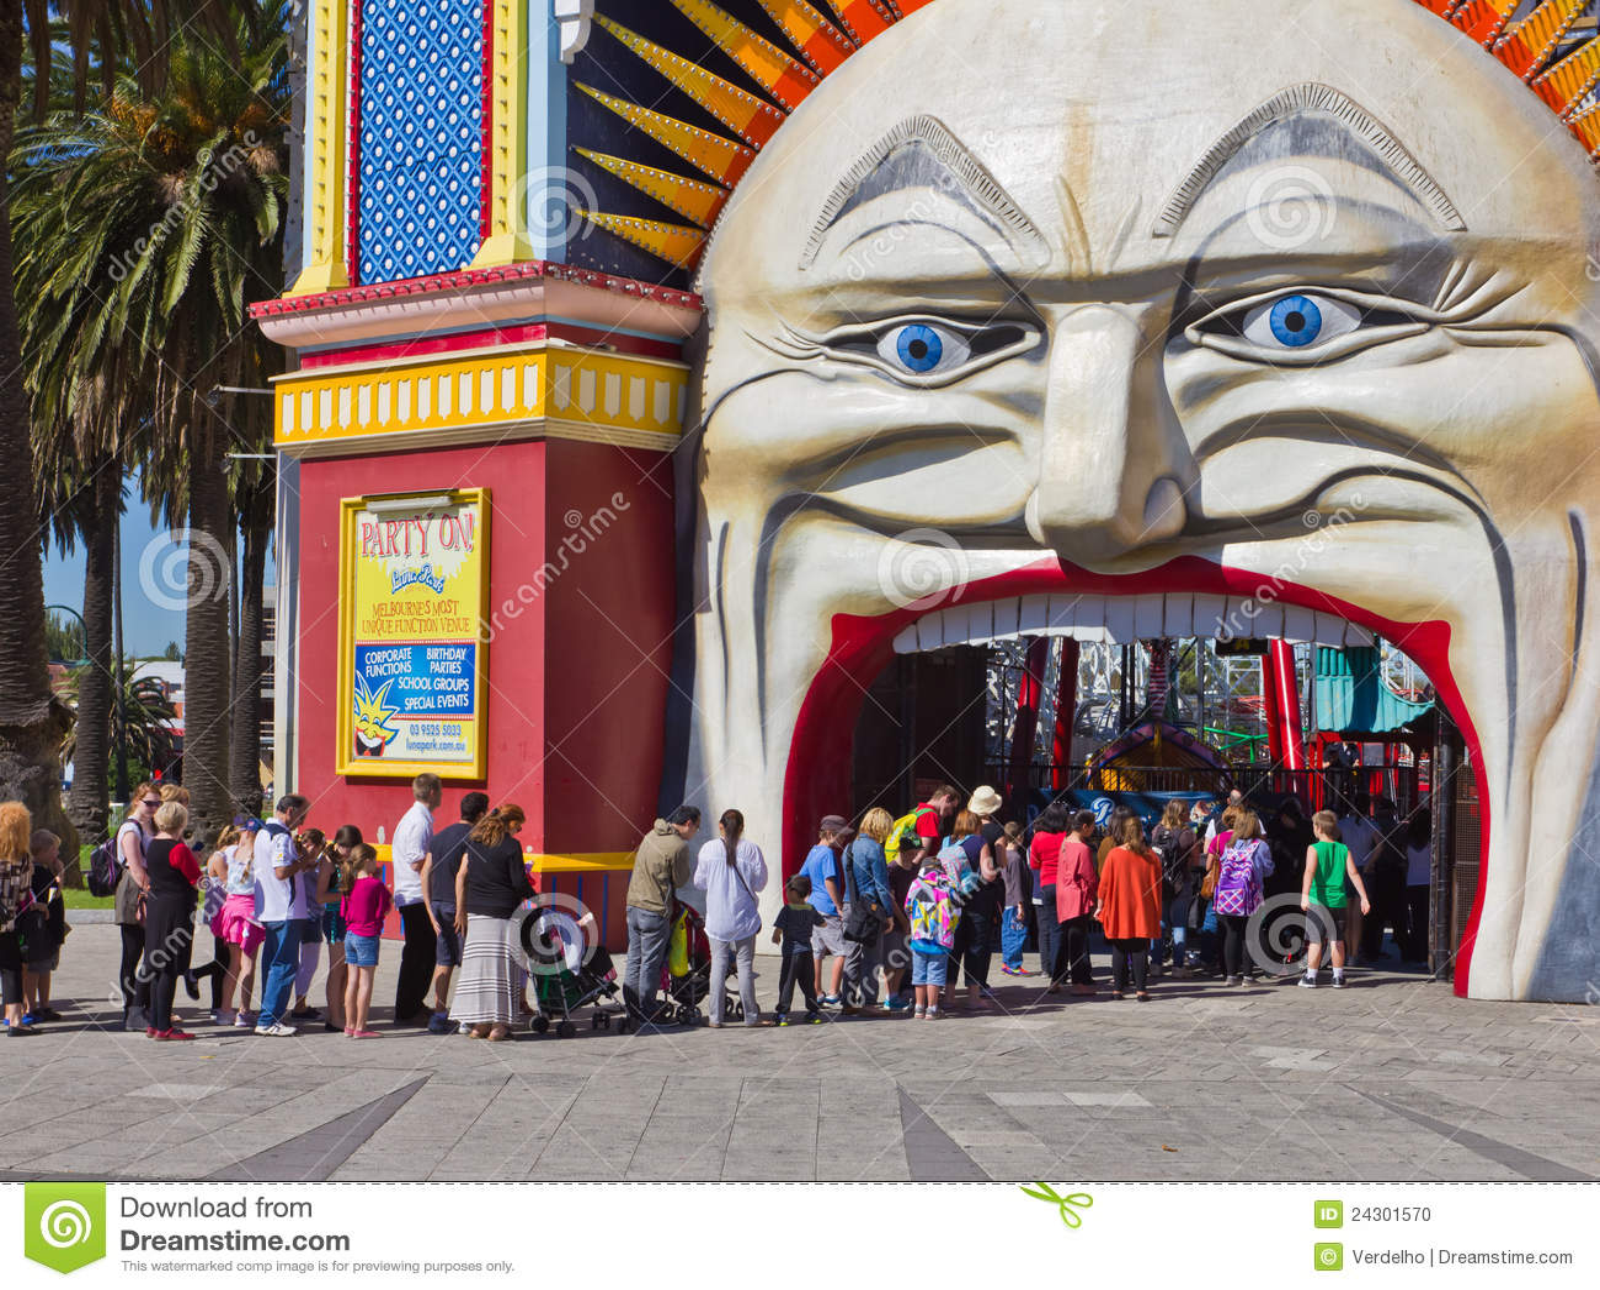 Enfileire para comprar bilhetes a Luna Park, Melbourne.